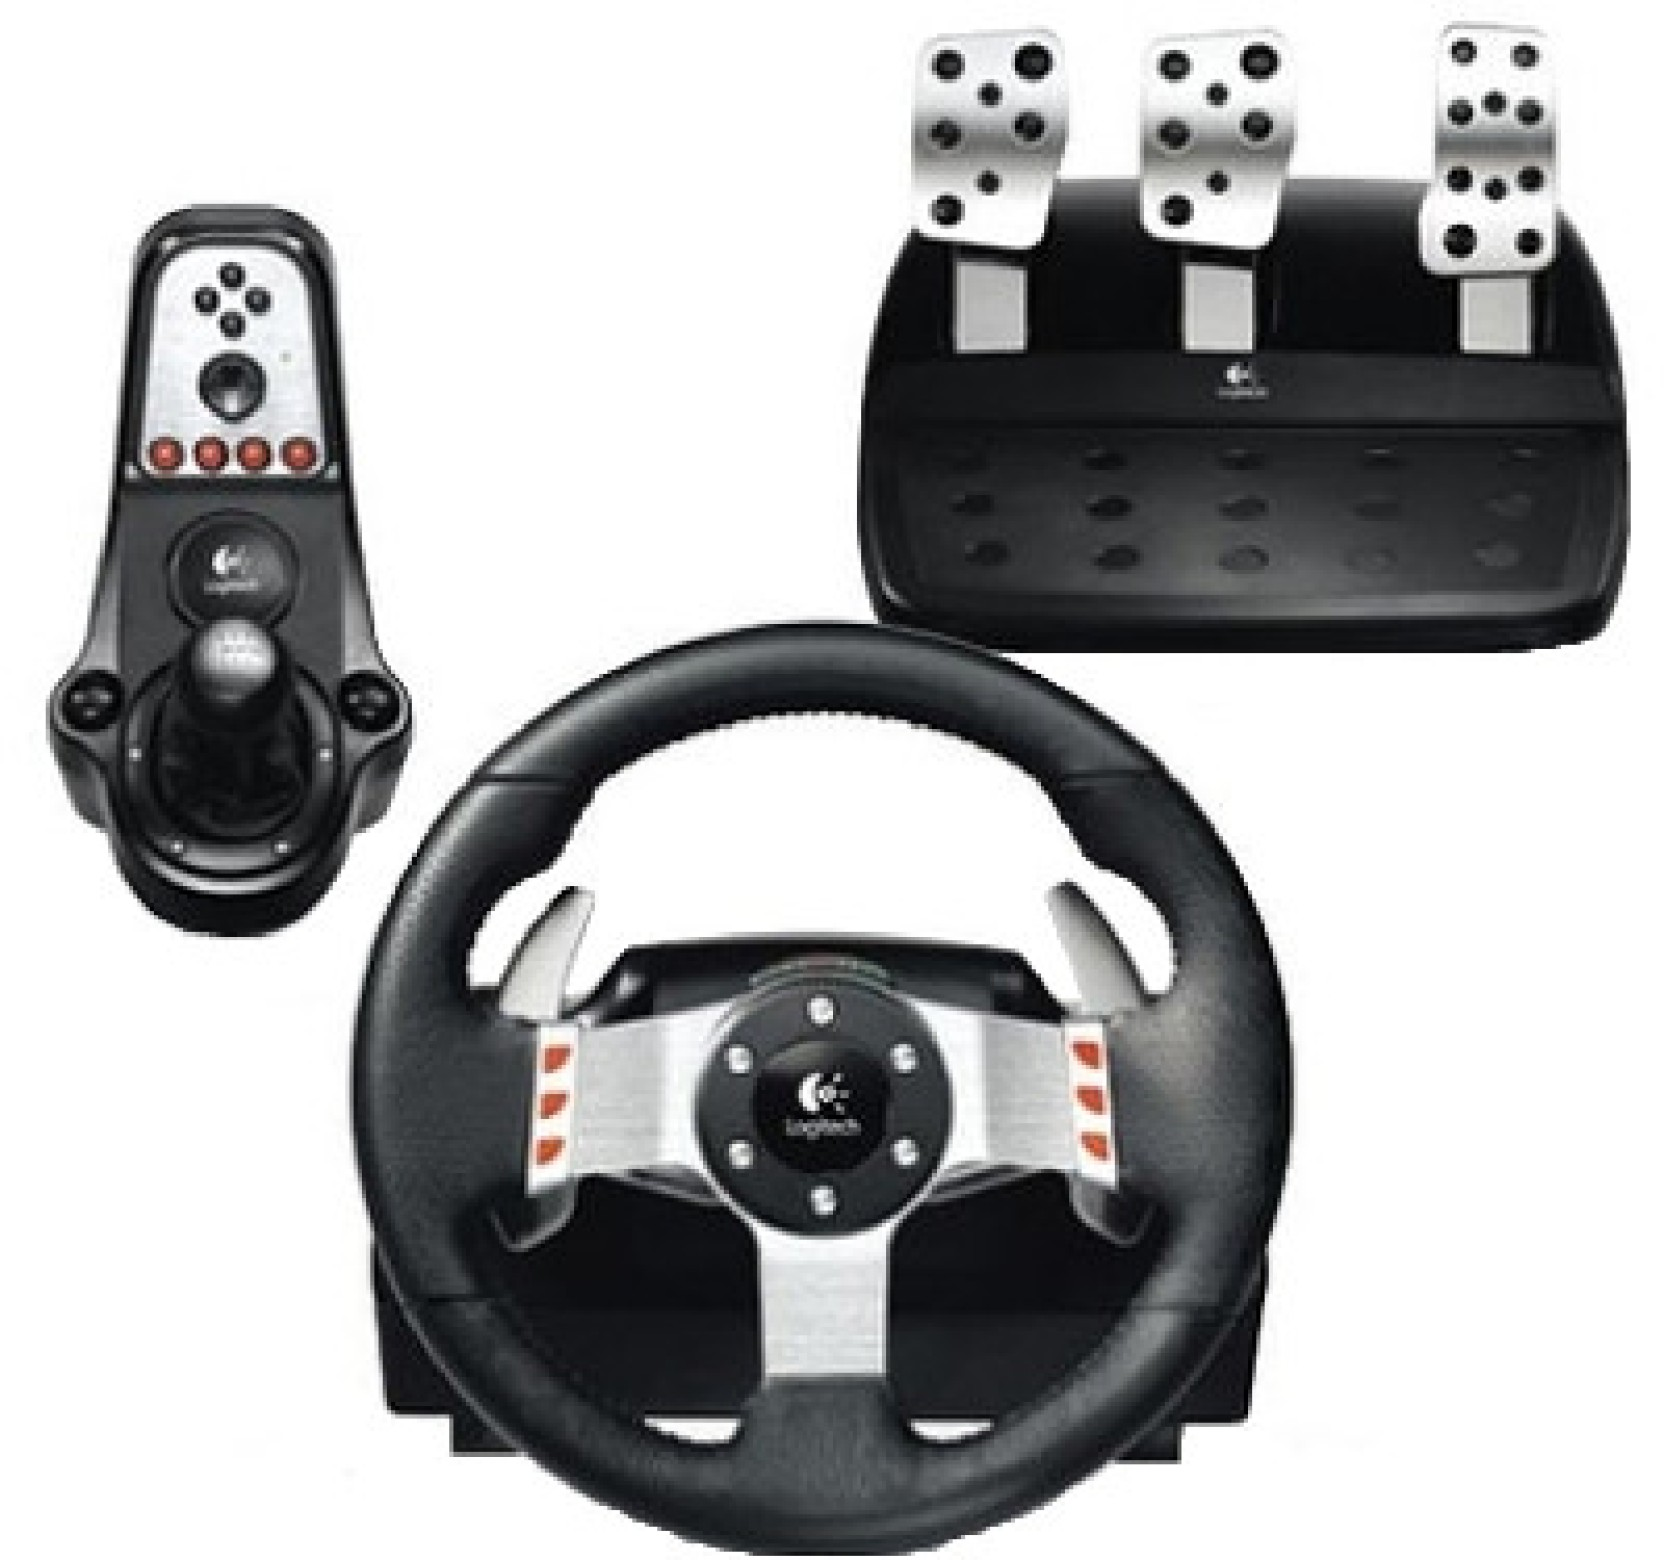 logitech g27 racing wheel logitech. Black Bedroom Furniture Sets. Home Design Ideas